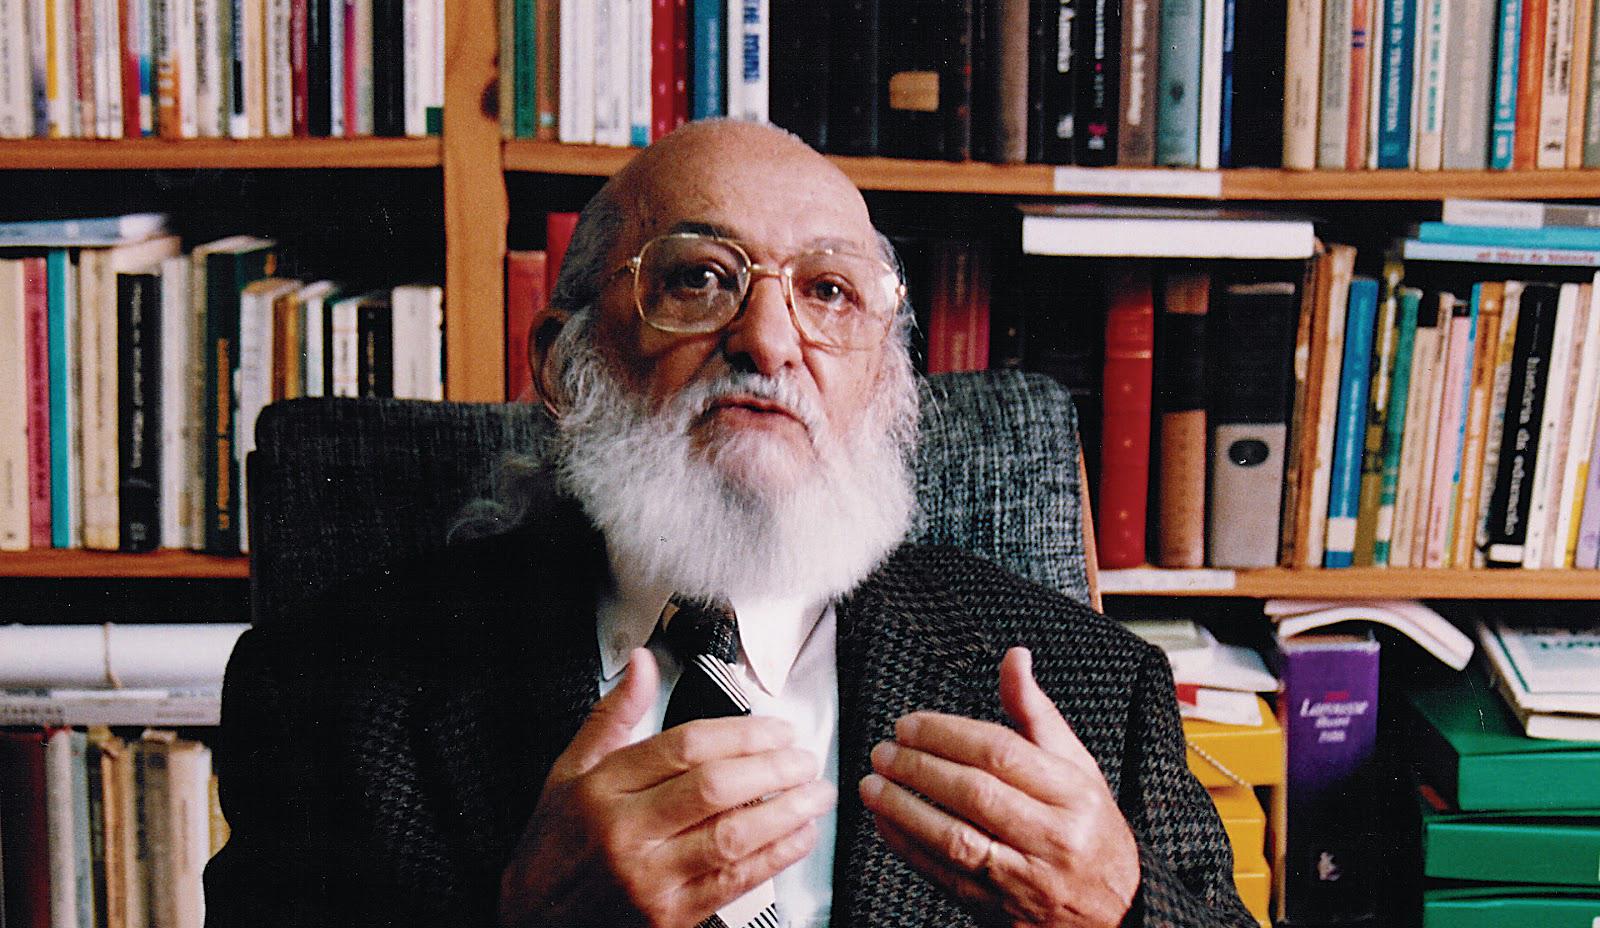 paulo_freire_na_biblioteca_do_ipf_instituto_paulo_freire21